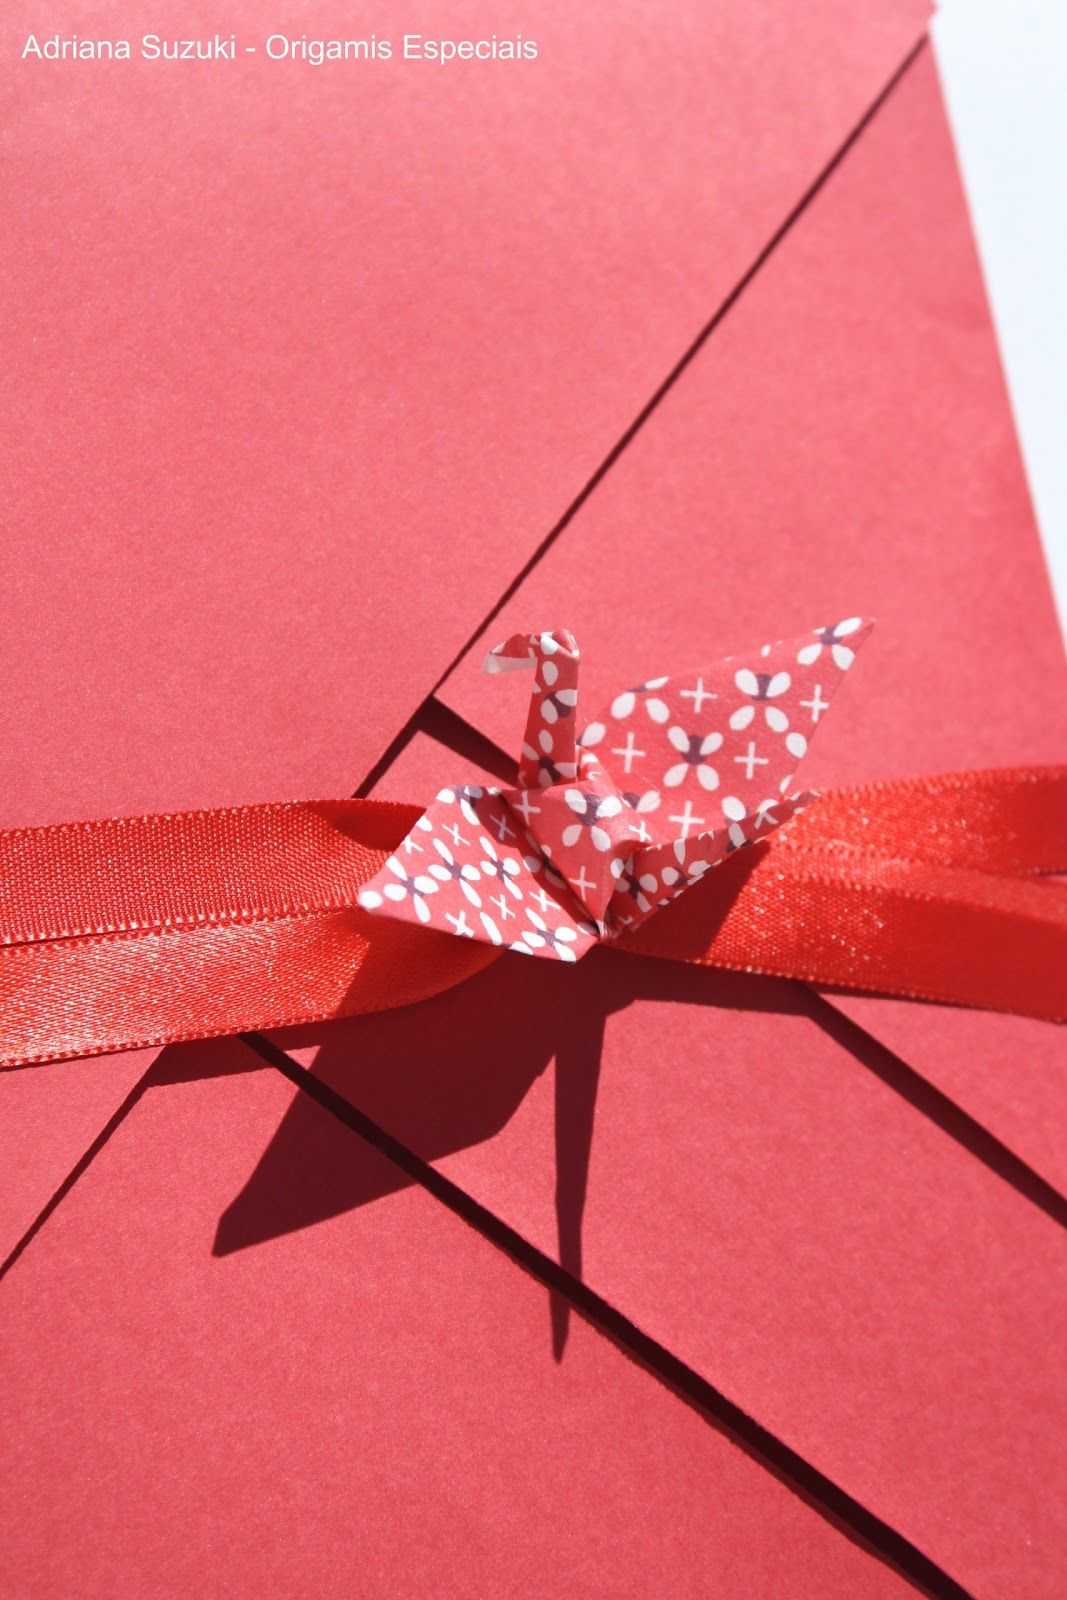 Adriana Suzuki: Envelopes de origami para convites de casamento ...